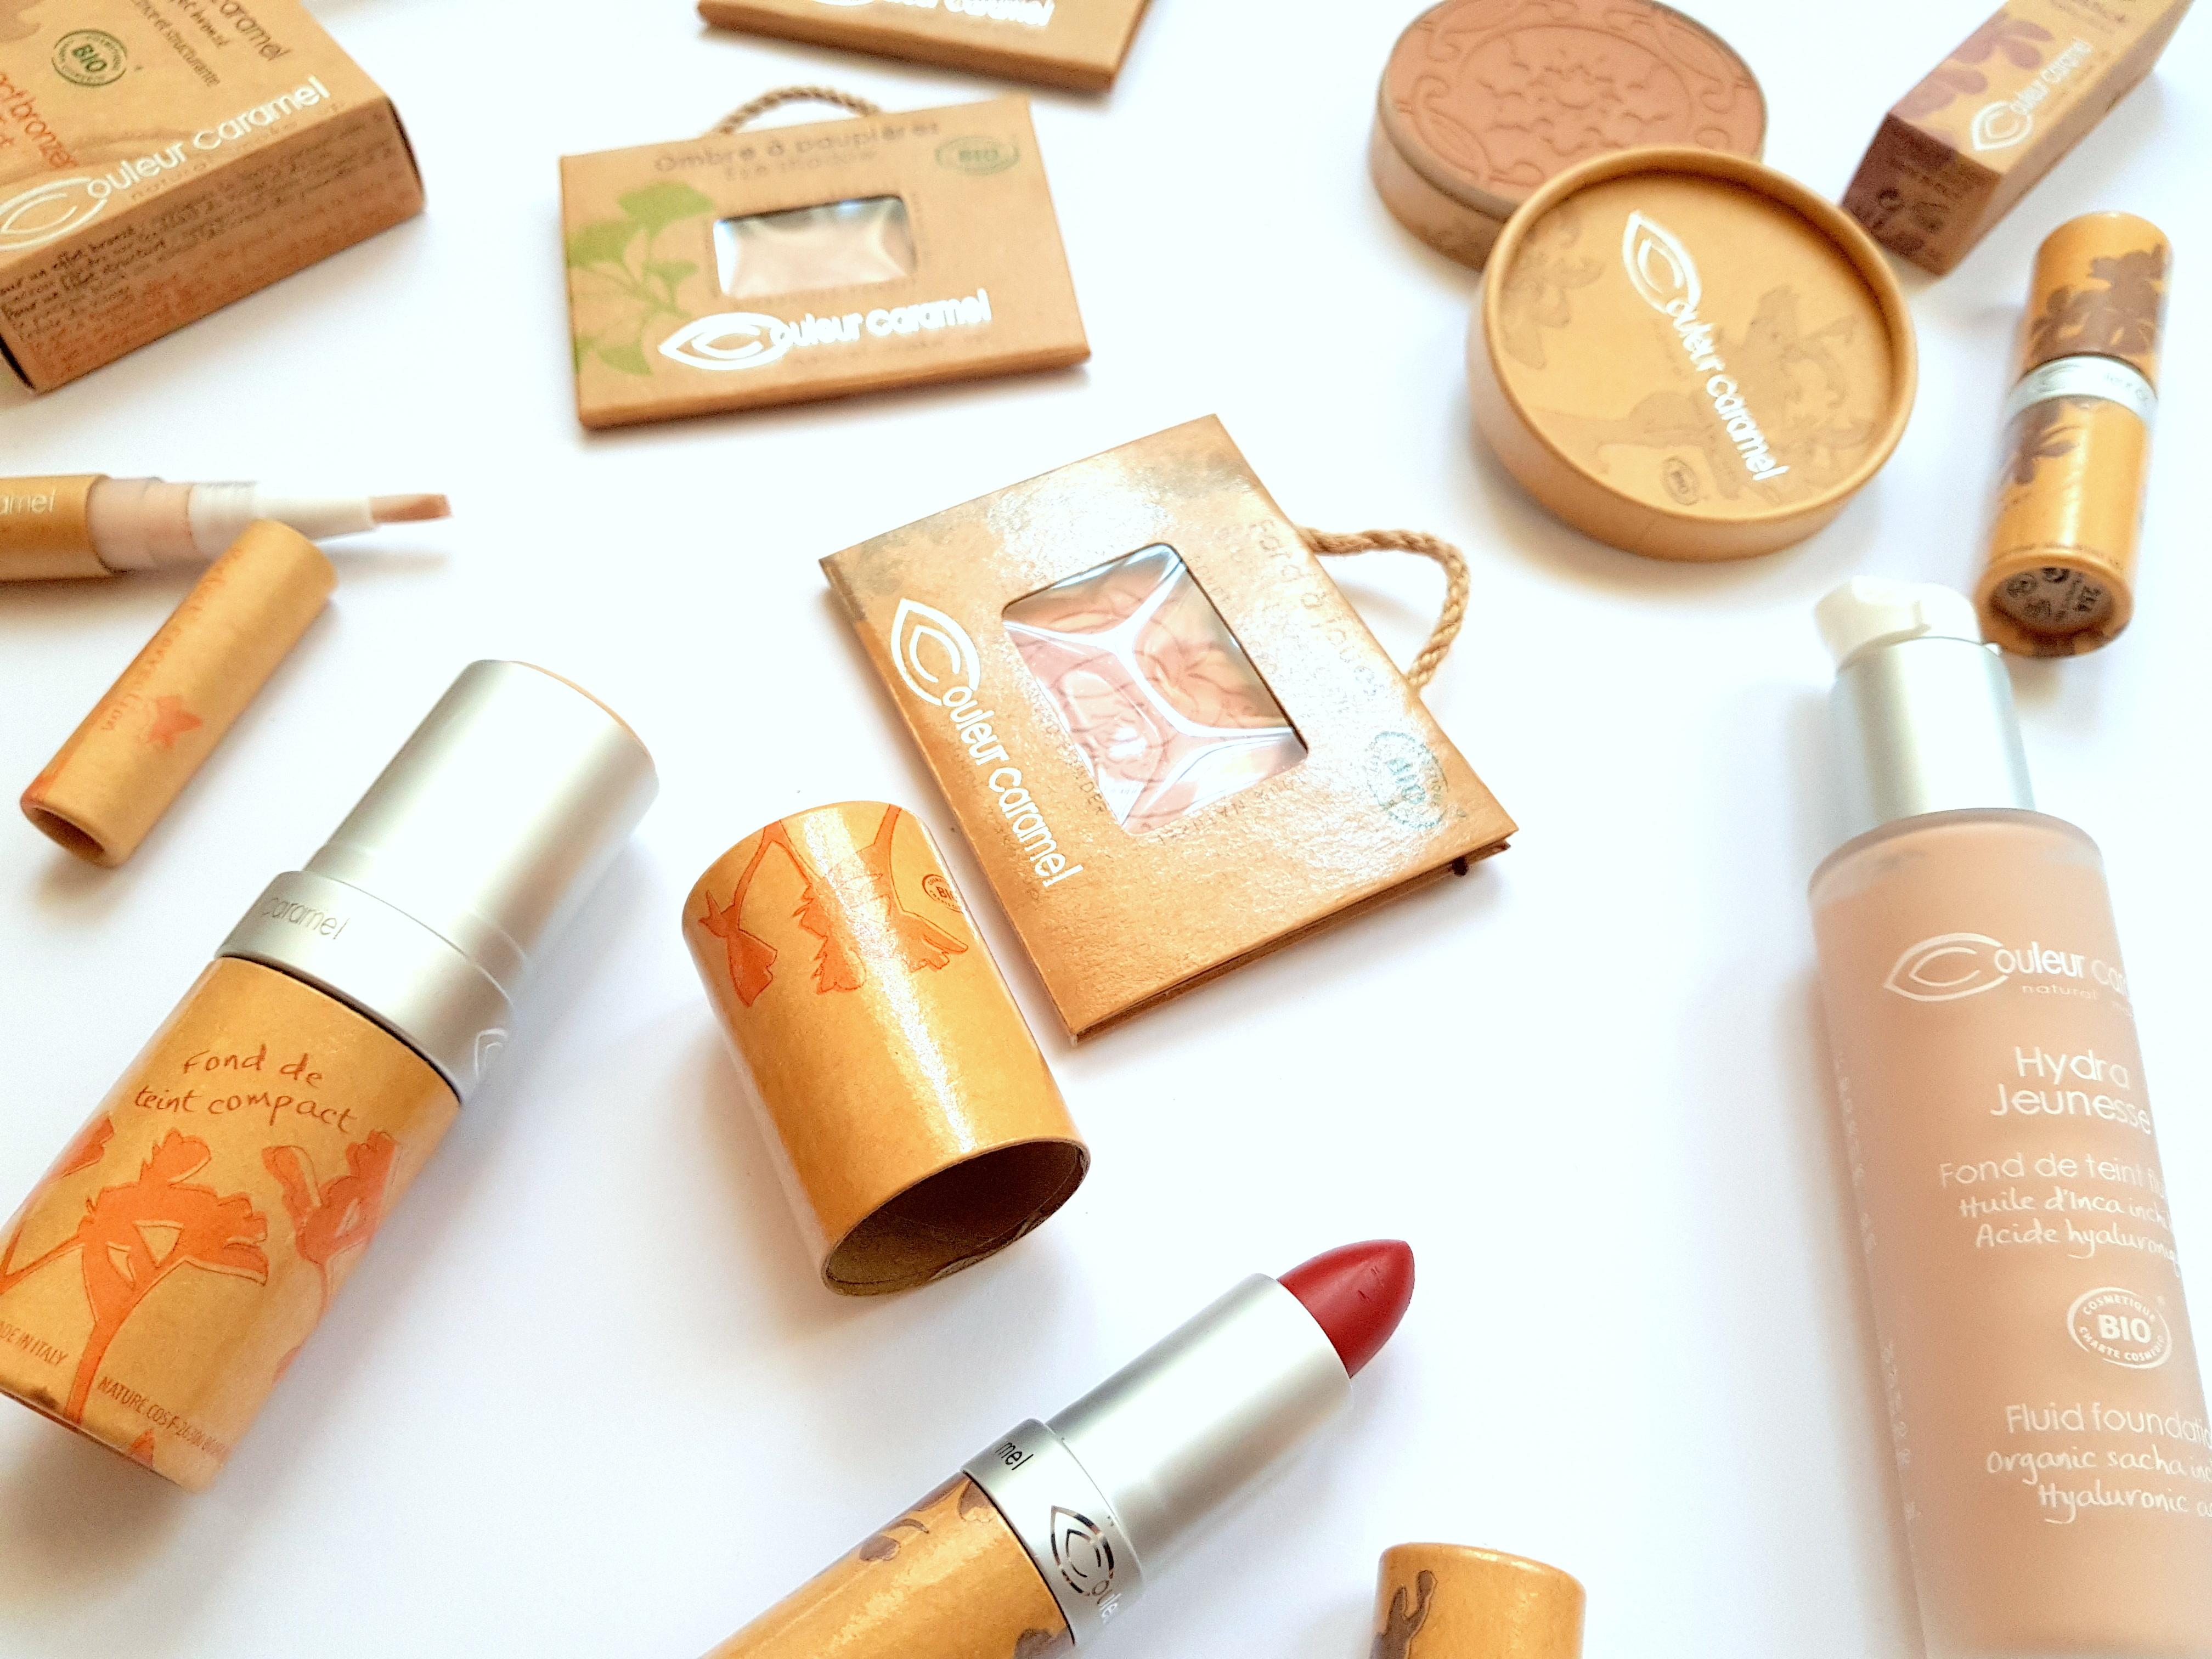 Couleur Caramel dekorativní kosmetika